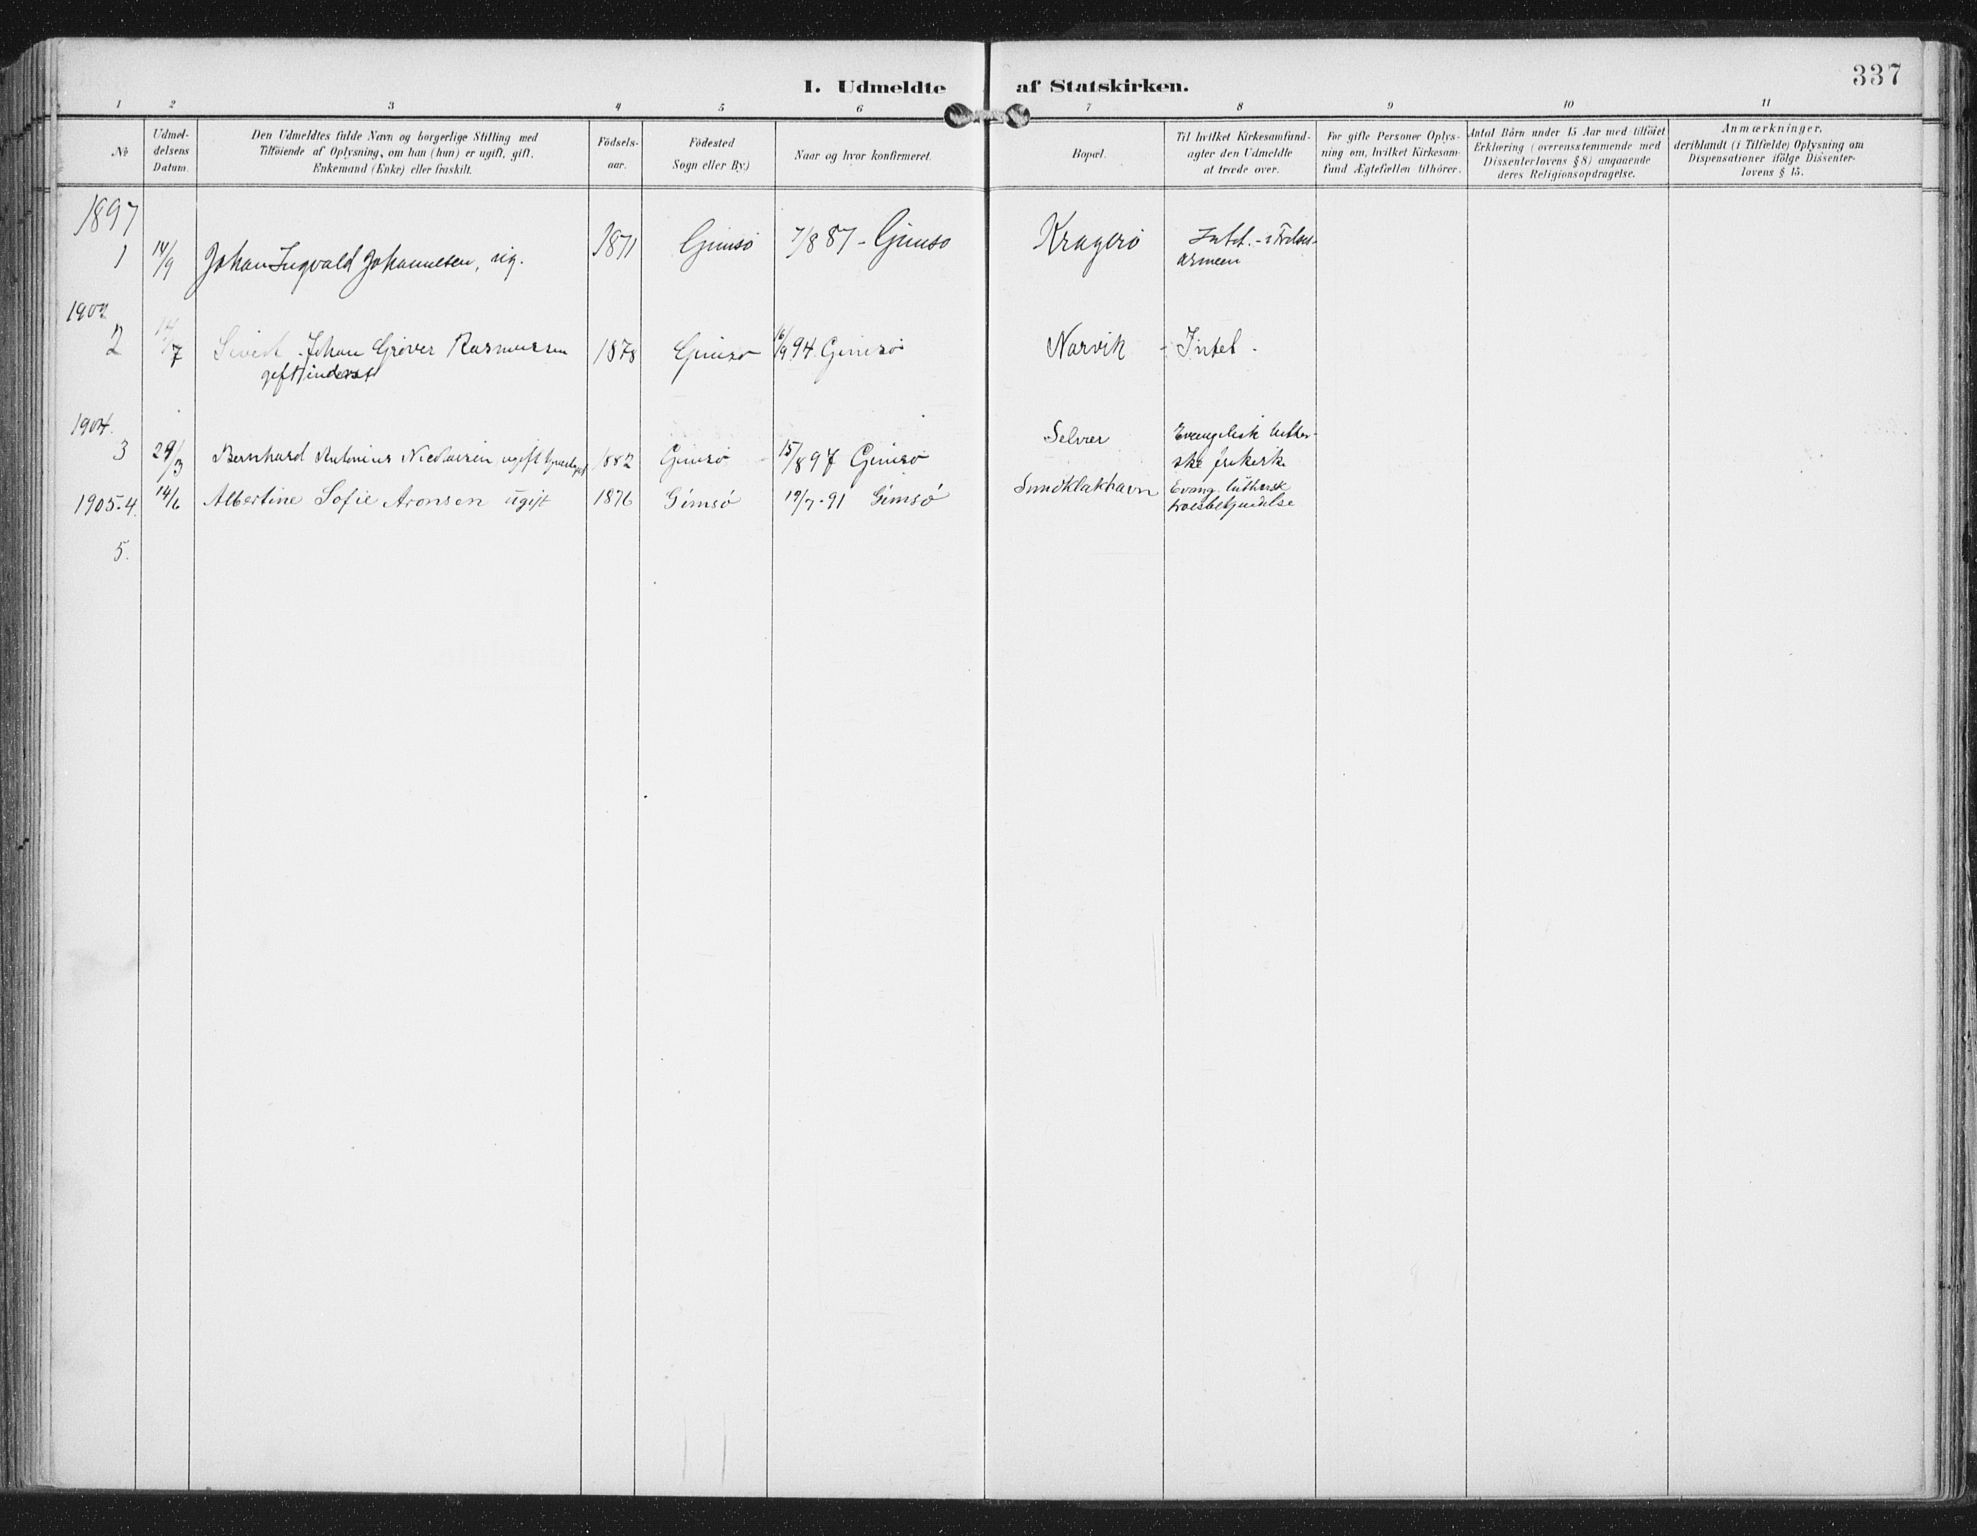 SAT, Ministerialprotokoller, klokkerbøker og fødselsregistre - Nordland, 876/L1098: Ministerialbok nr. 876A04, 1896-1915, s. 337